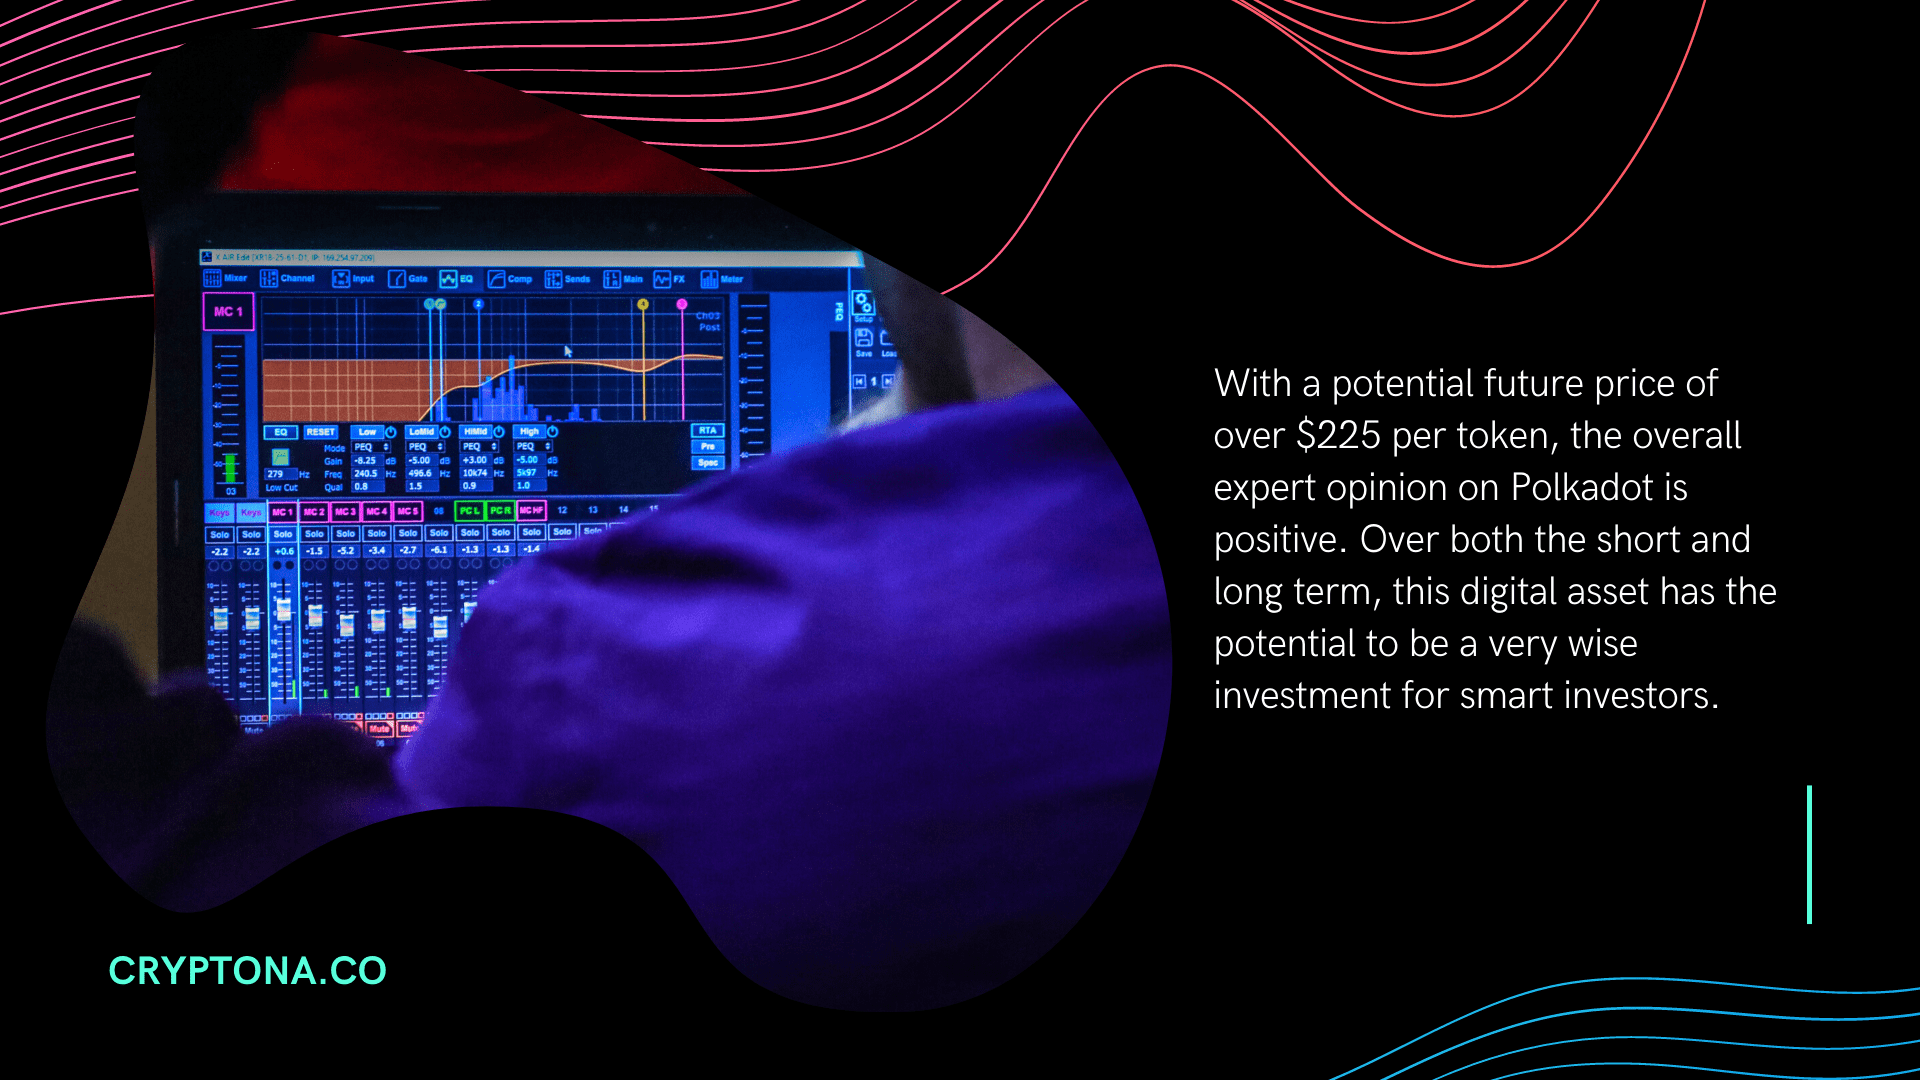 Expert analysis of the Polkadot price potential